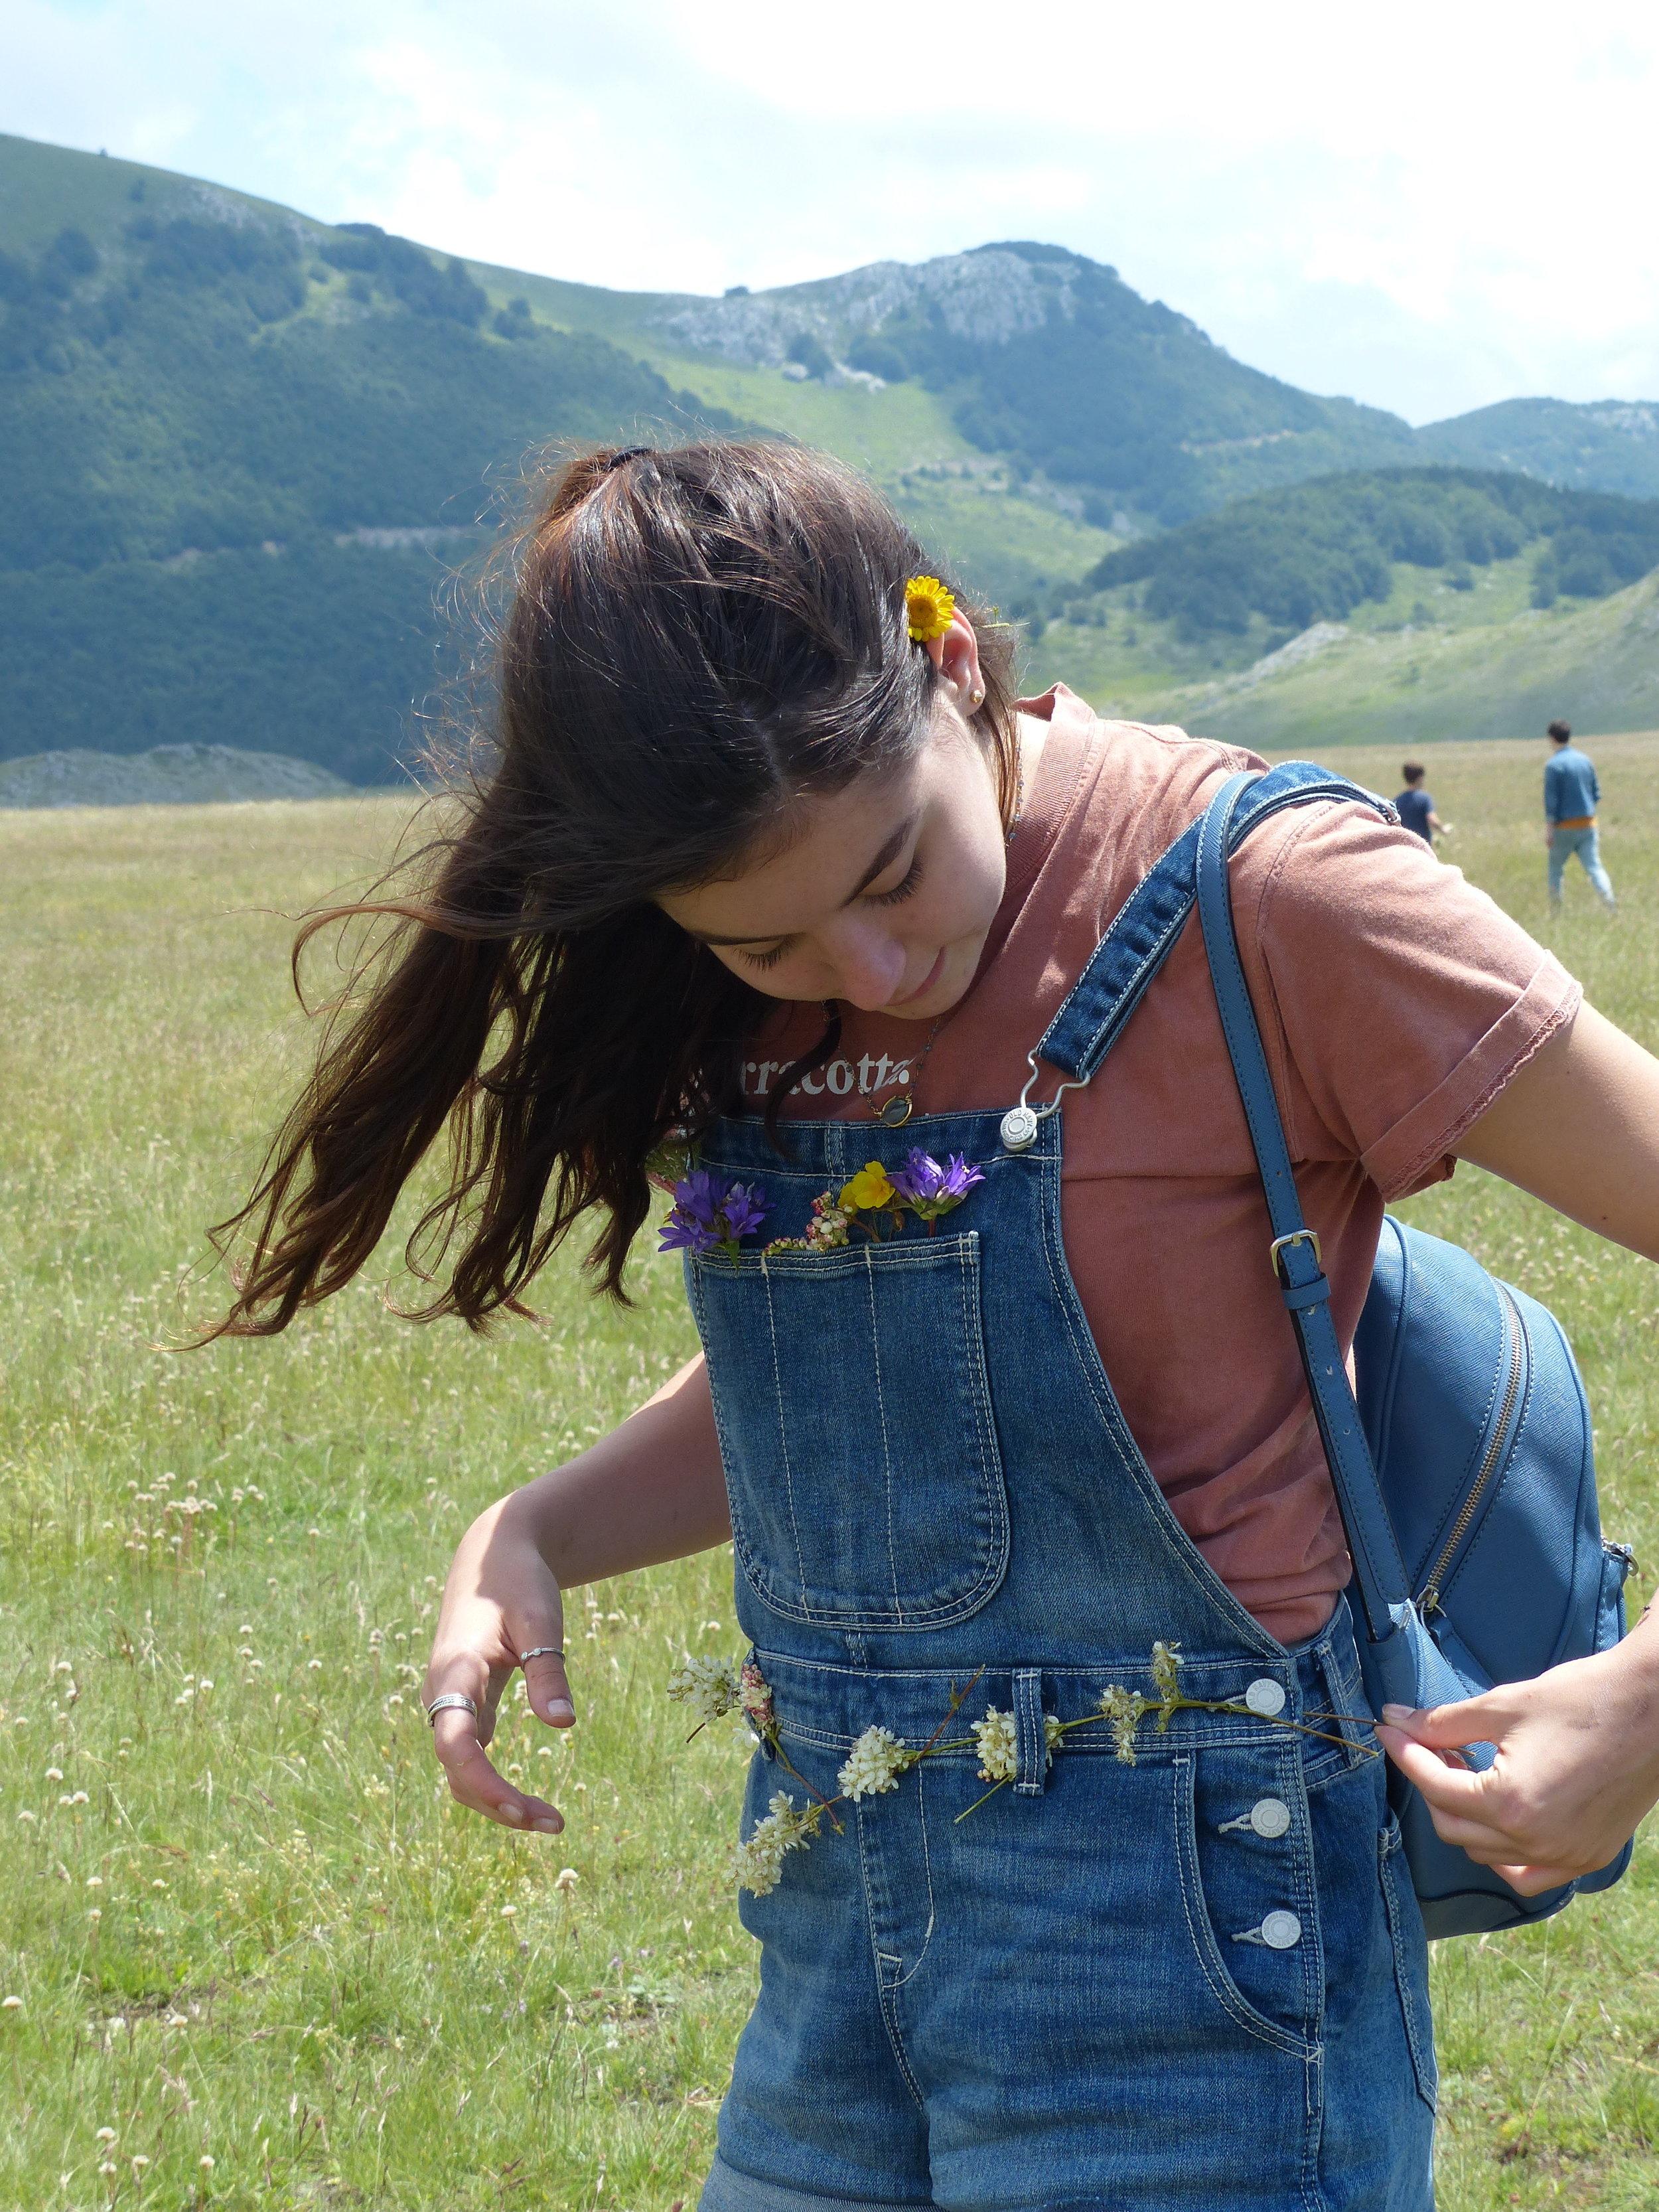 Siena festoons herself with wildflowers outside Ristoro Mucciante in Abruzzo